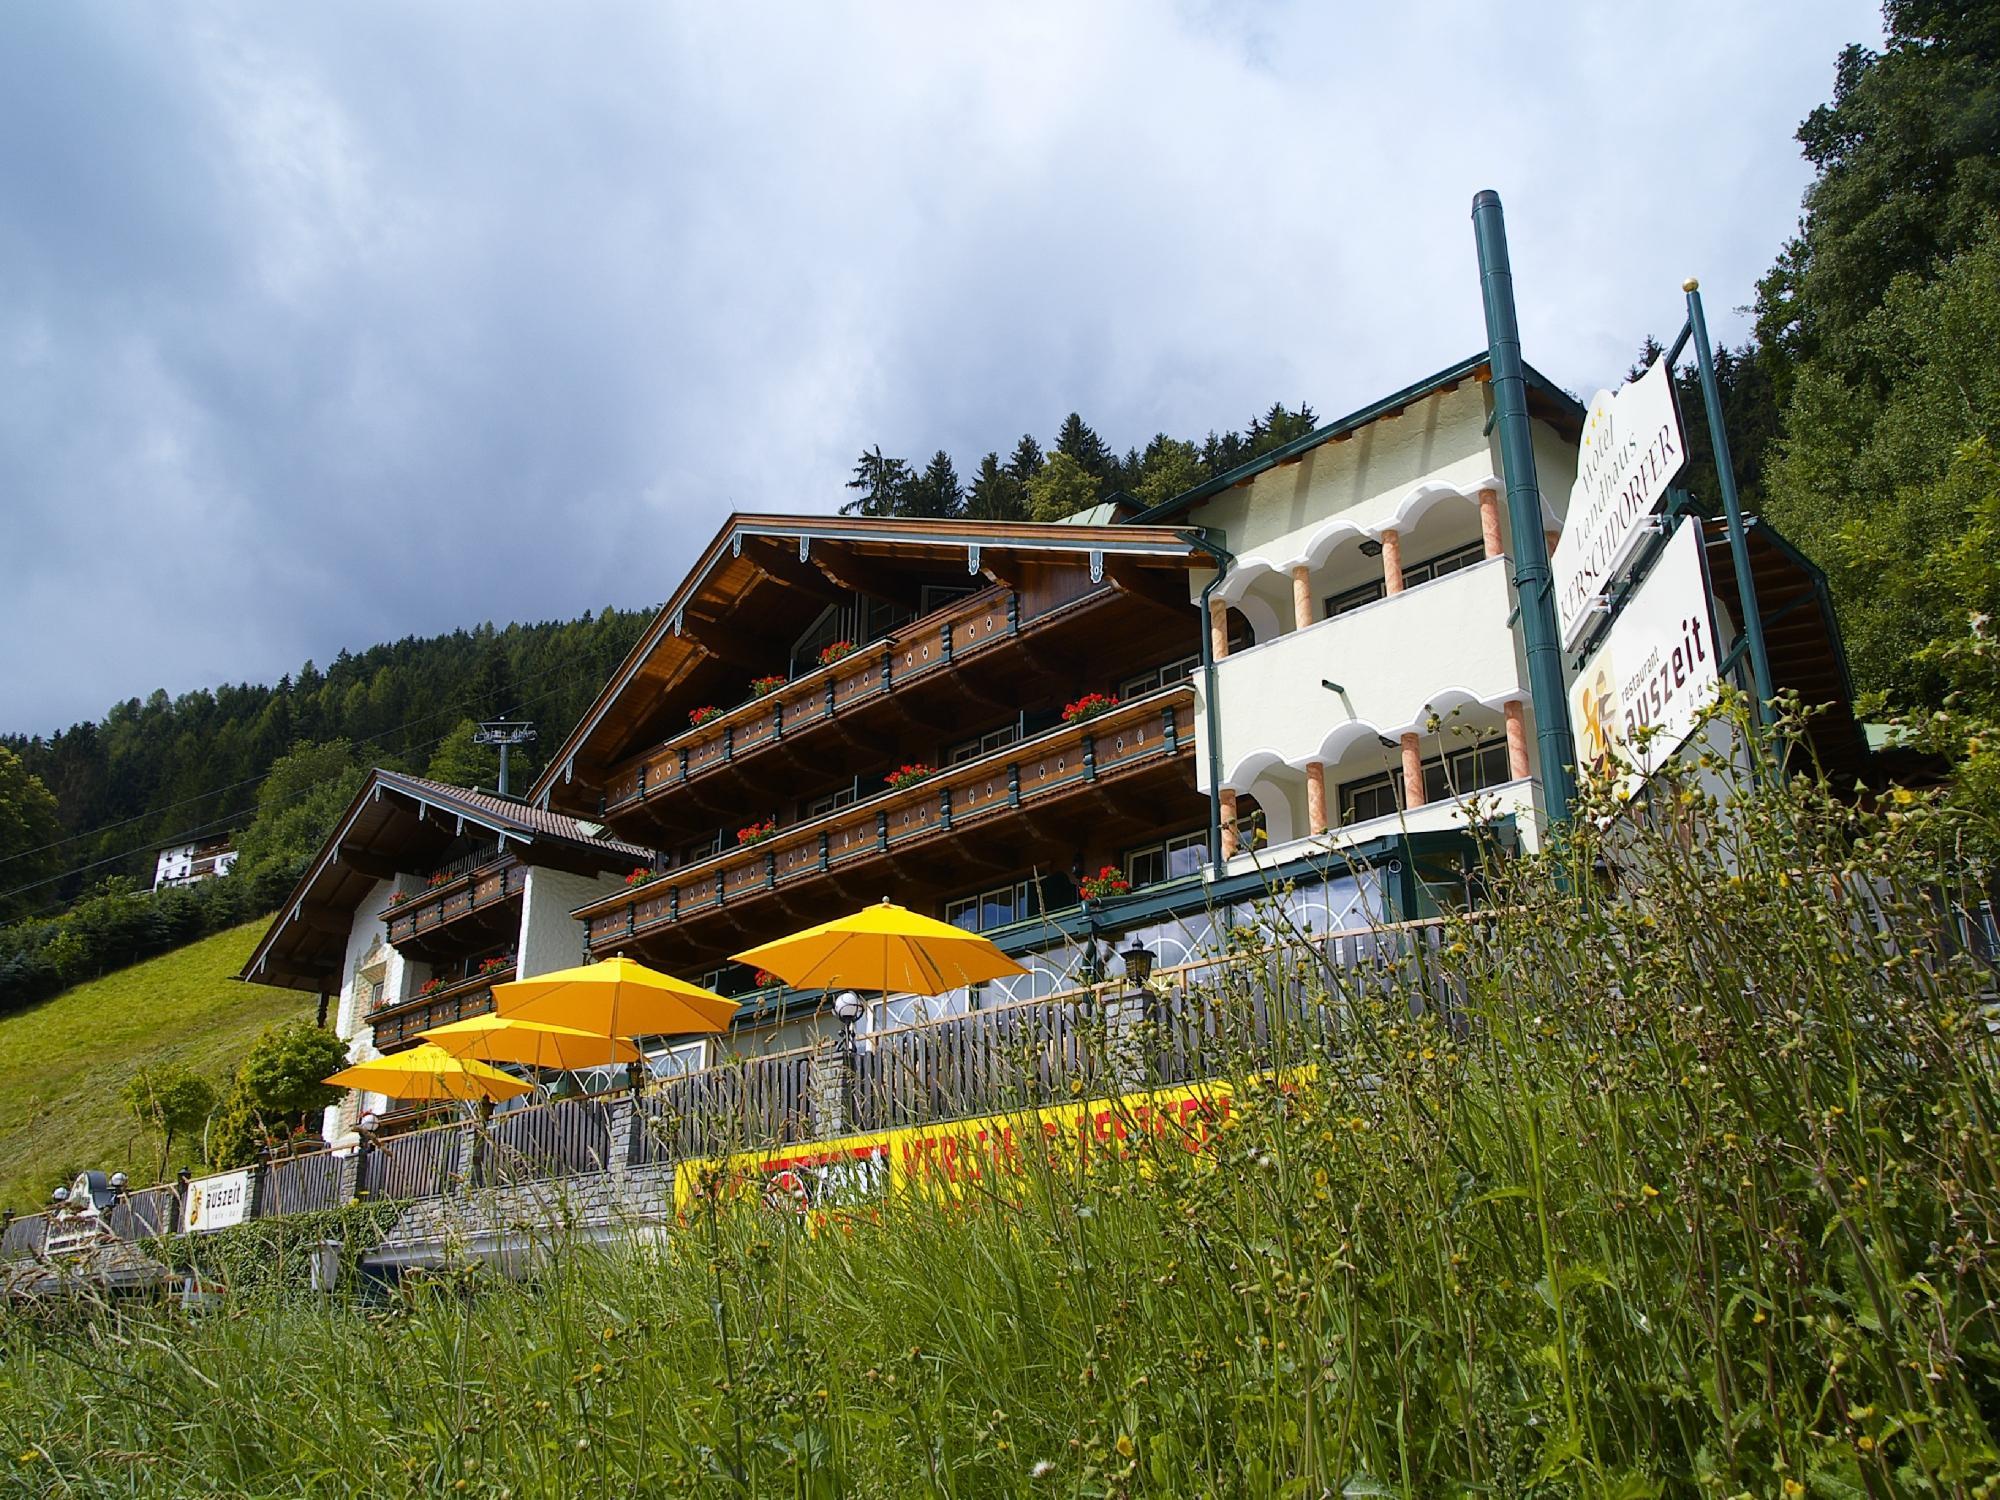 Kaltenbach Austria  City pictures : Hotel Landhaus Kerschdorfer Kaltenbach, Austria Hotel Reviews ...